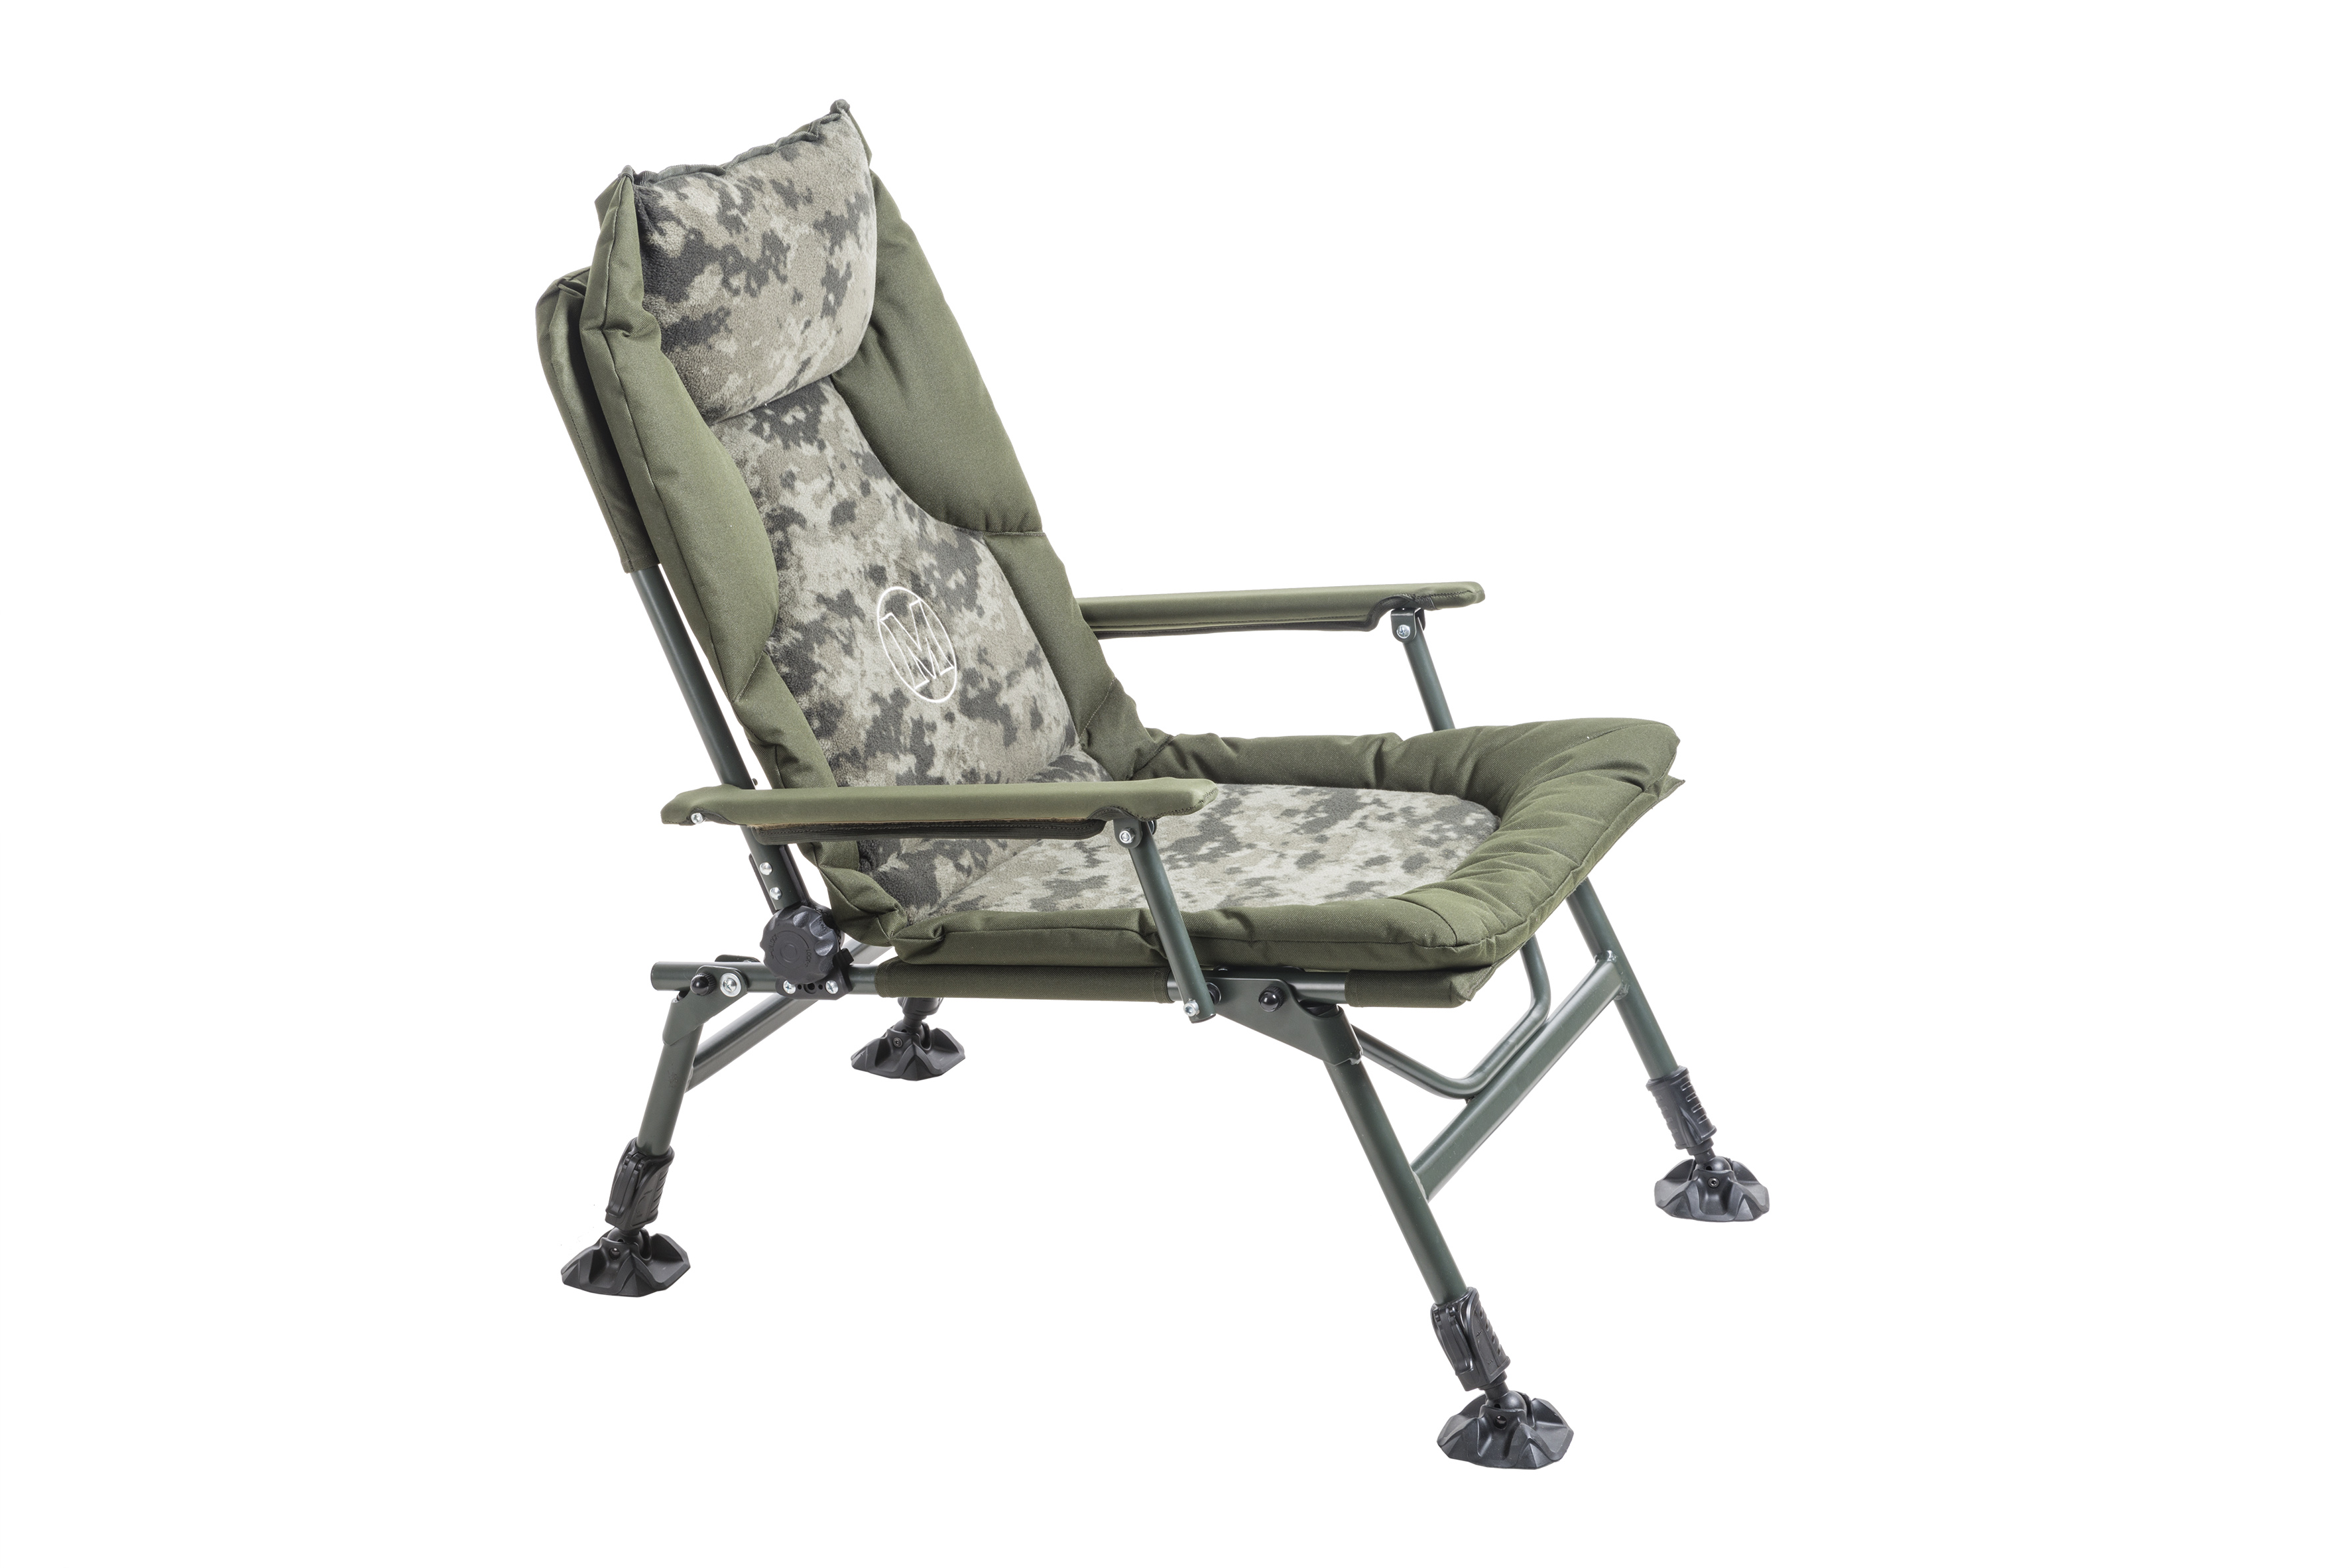 M-CHCCA Chair CamoCODE Arm